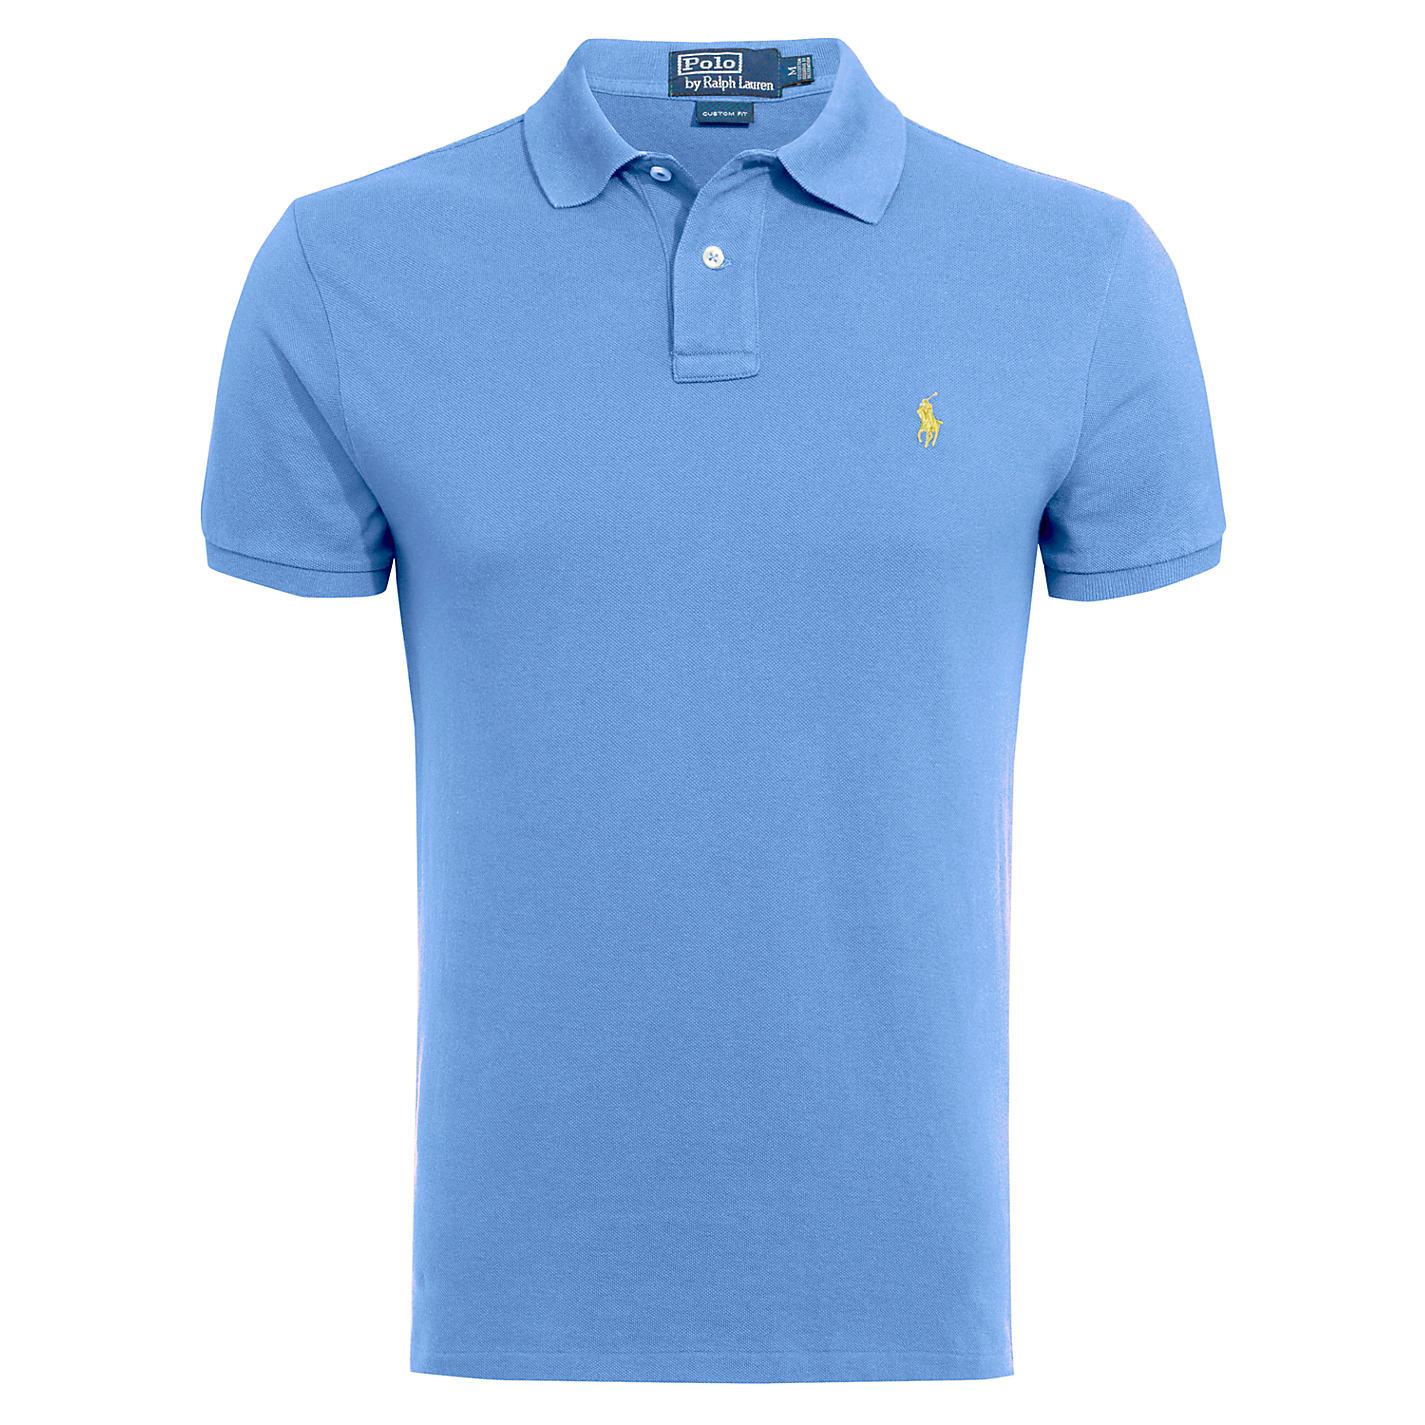 Shirt design for man 2016 - Man Shirts